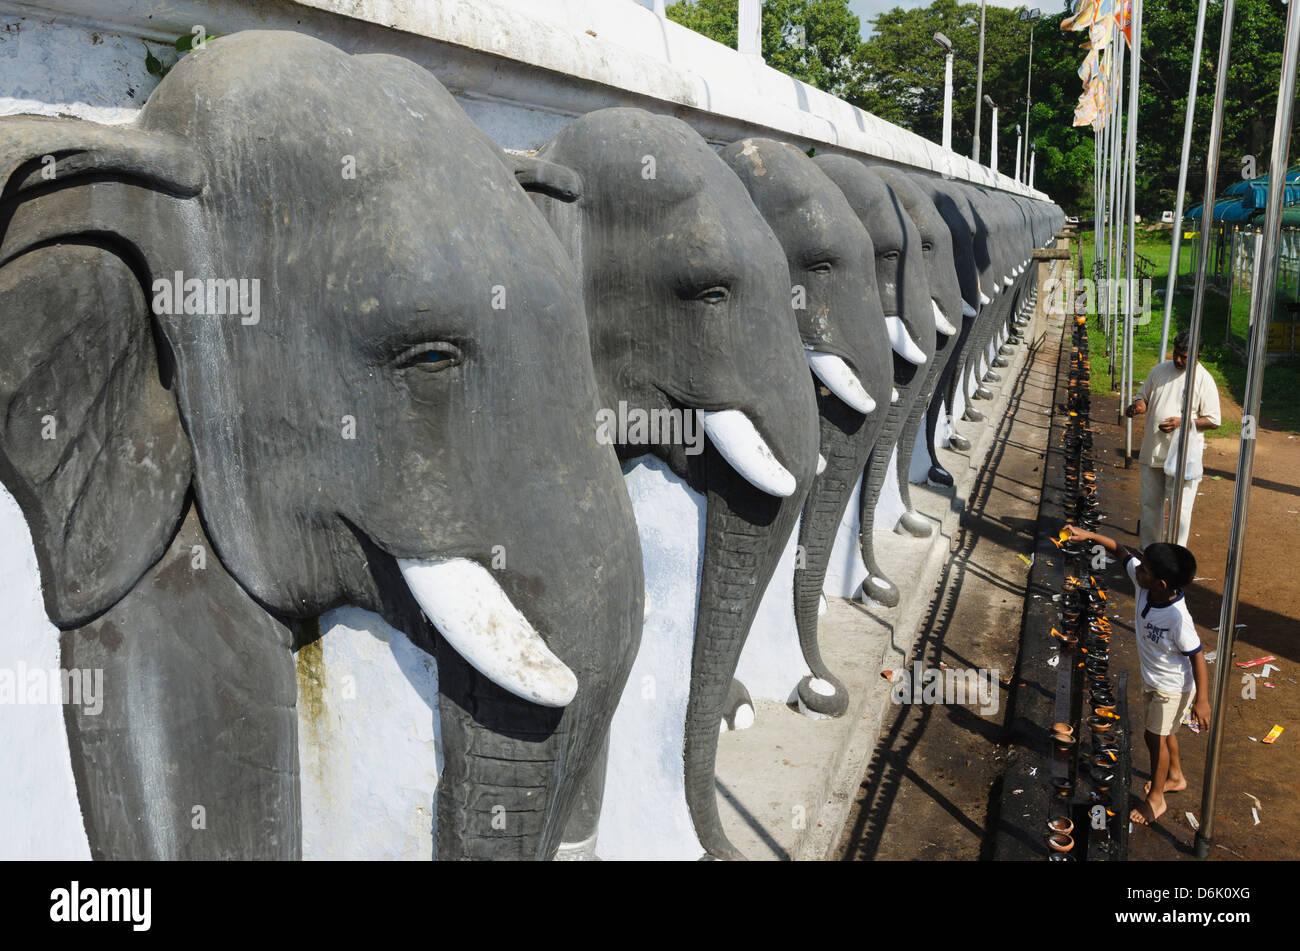 Ruvanvelisaya Dagoba, Anuradhapura, UNESCO World Heritage Site, North Central Province, Sri Lanka, Asia - Stock Image